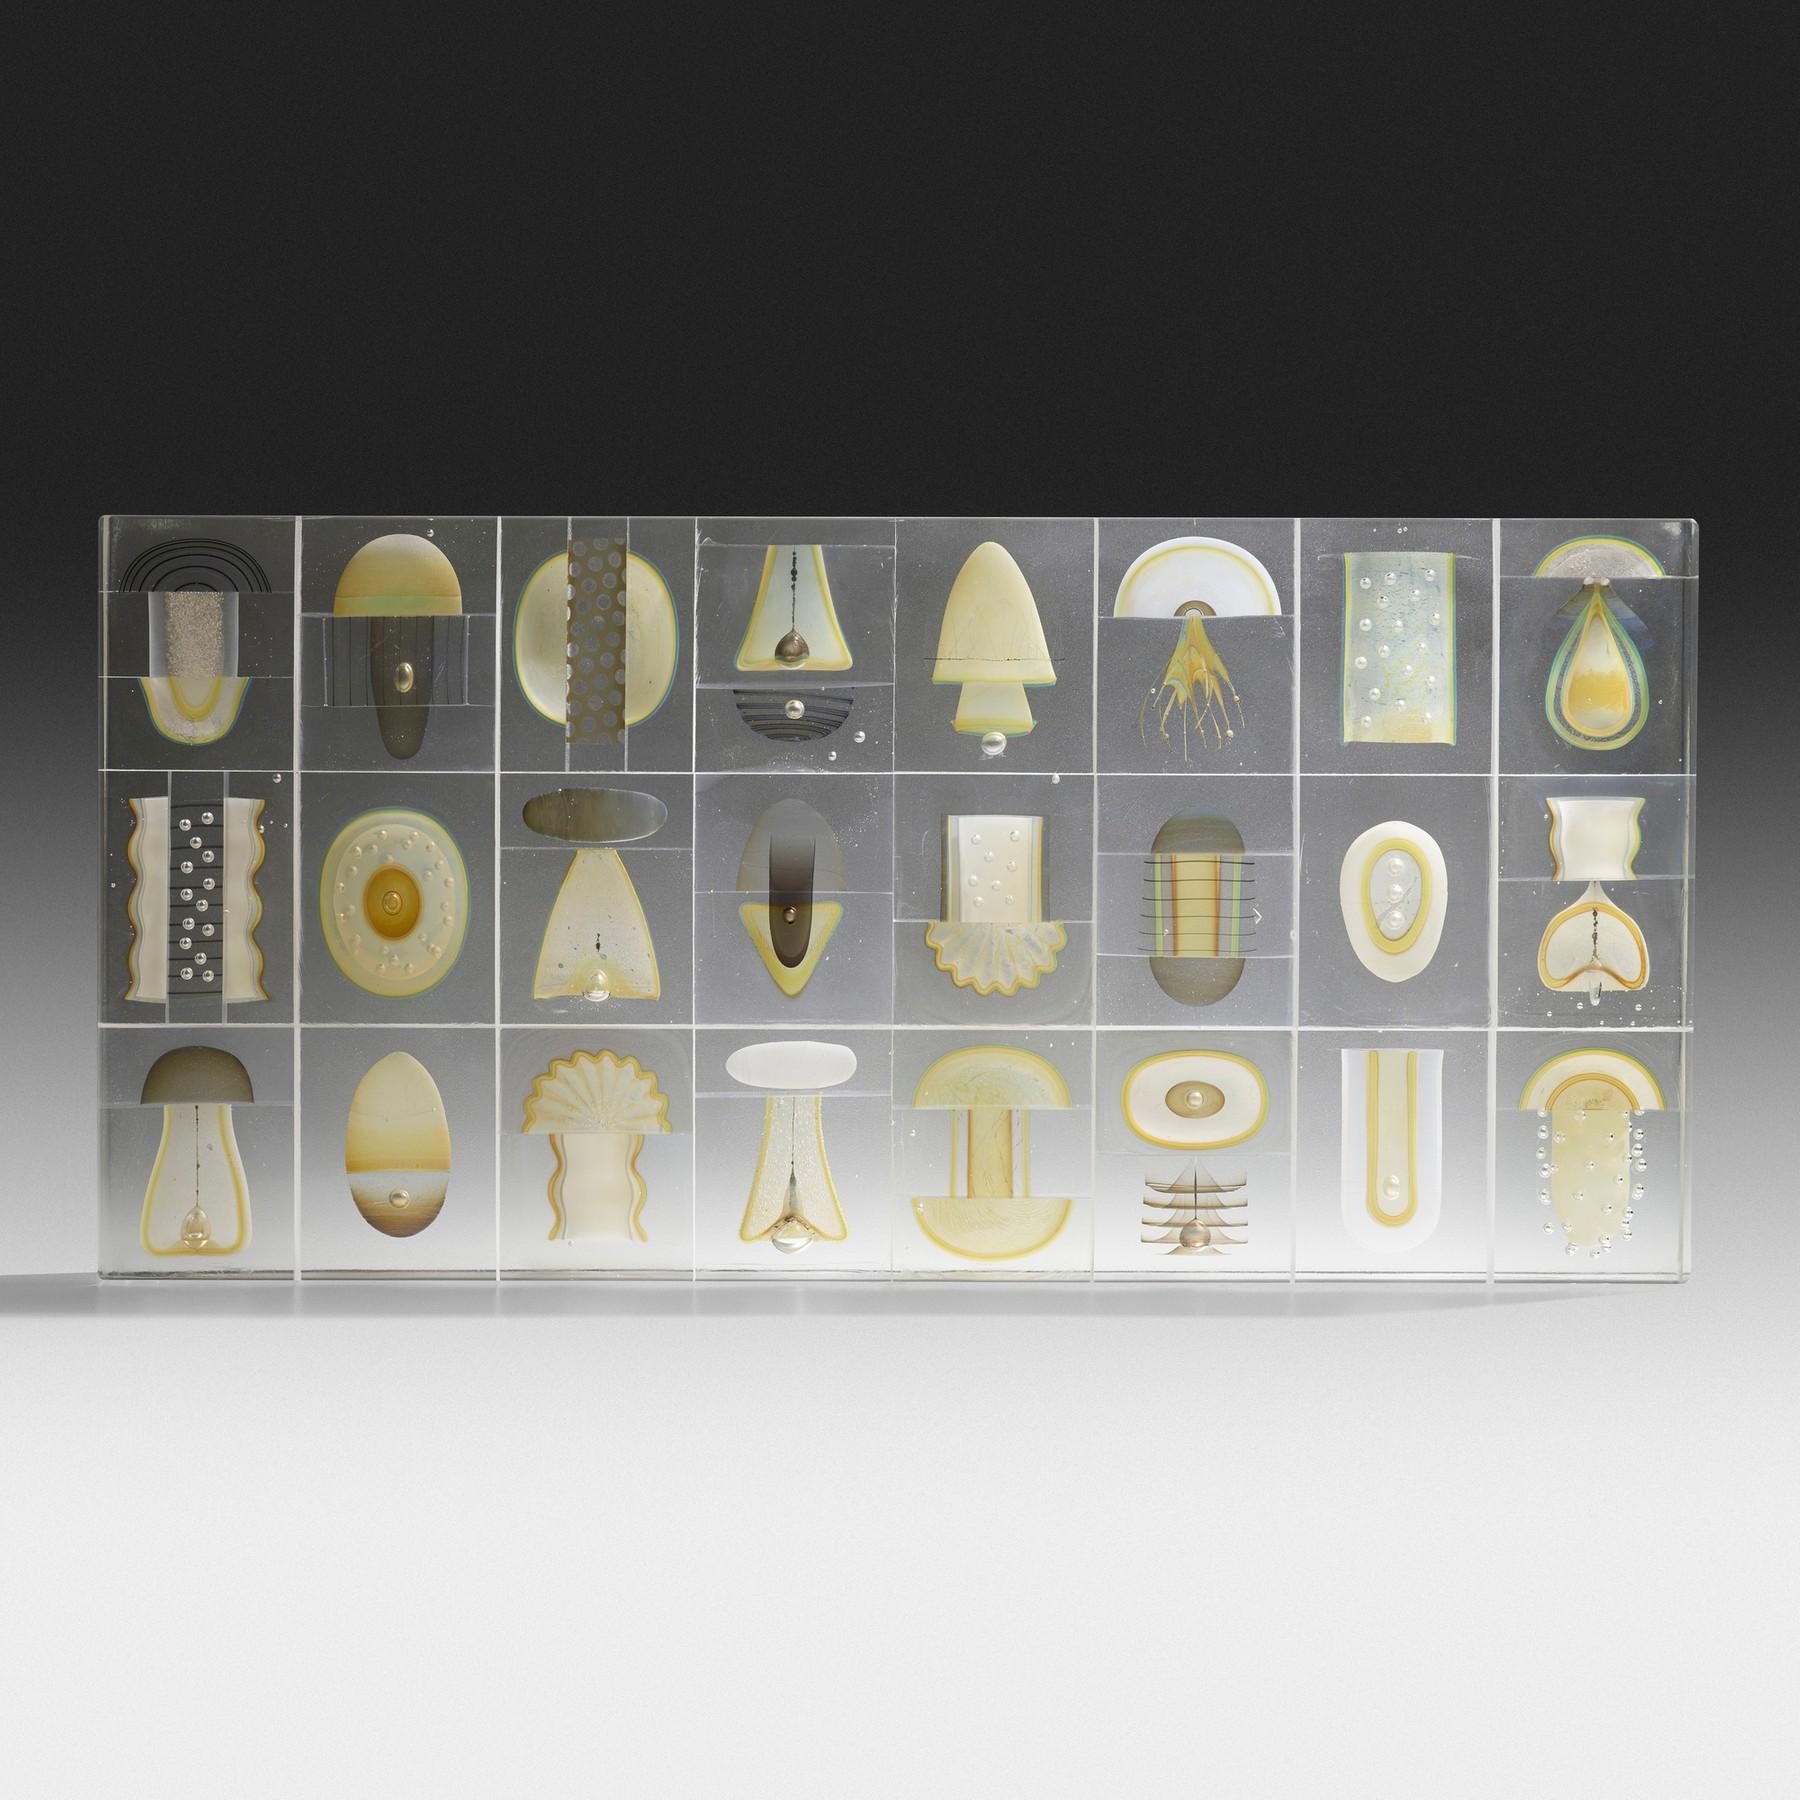 665_1_modern_design_january_2021_steffen_dam_flower_block__rago_auction.jpg?t=1608645400